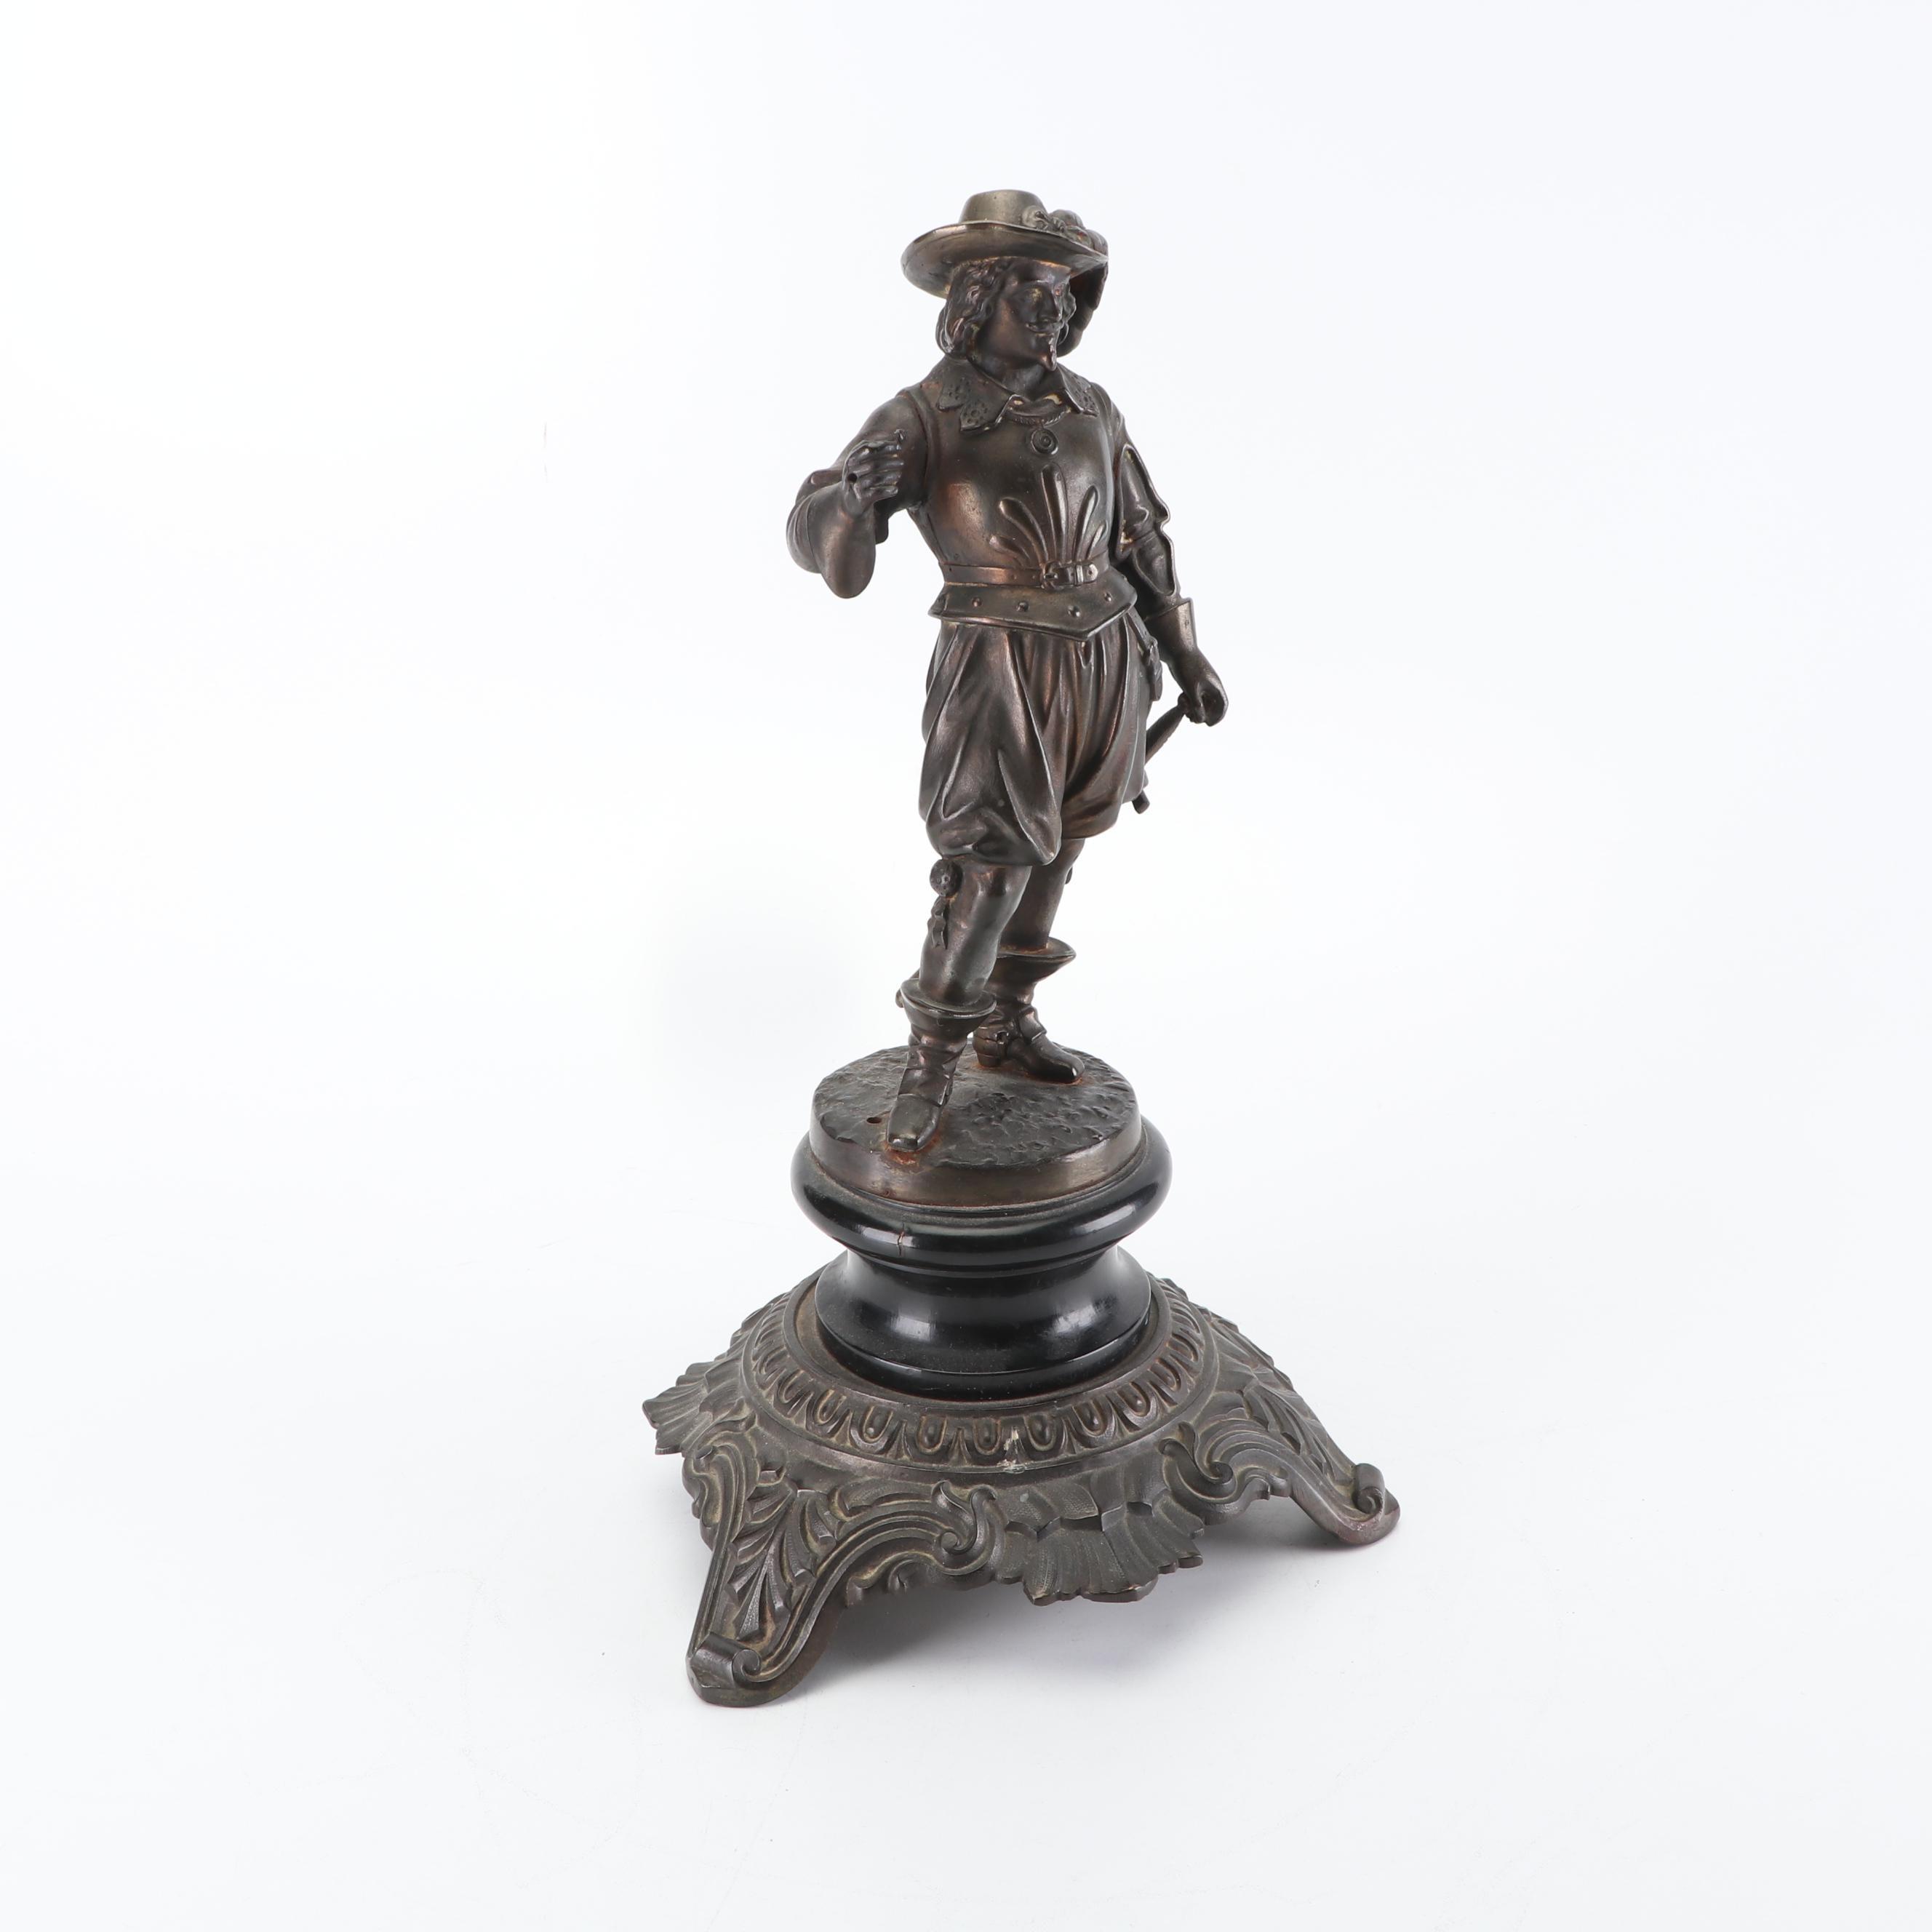 E.G. Zimmermann Cast Metal Knight Figurine